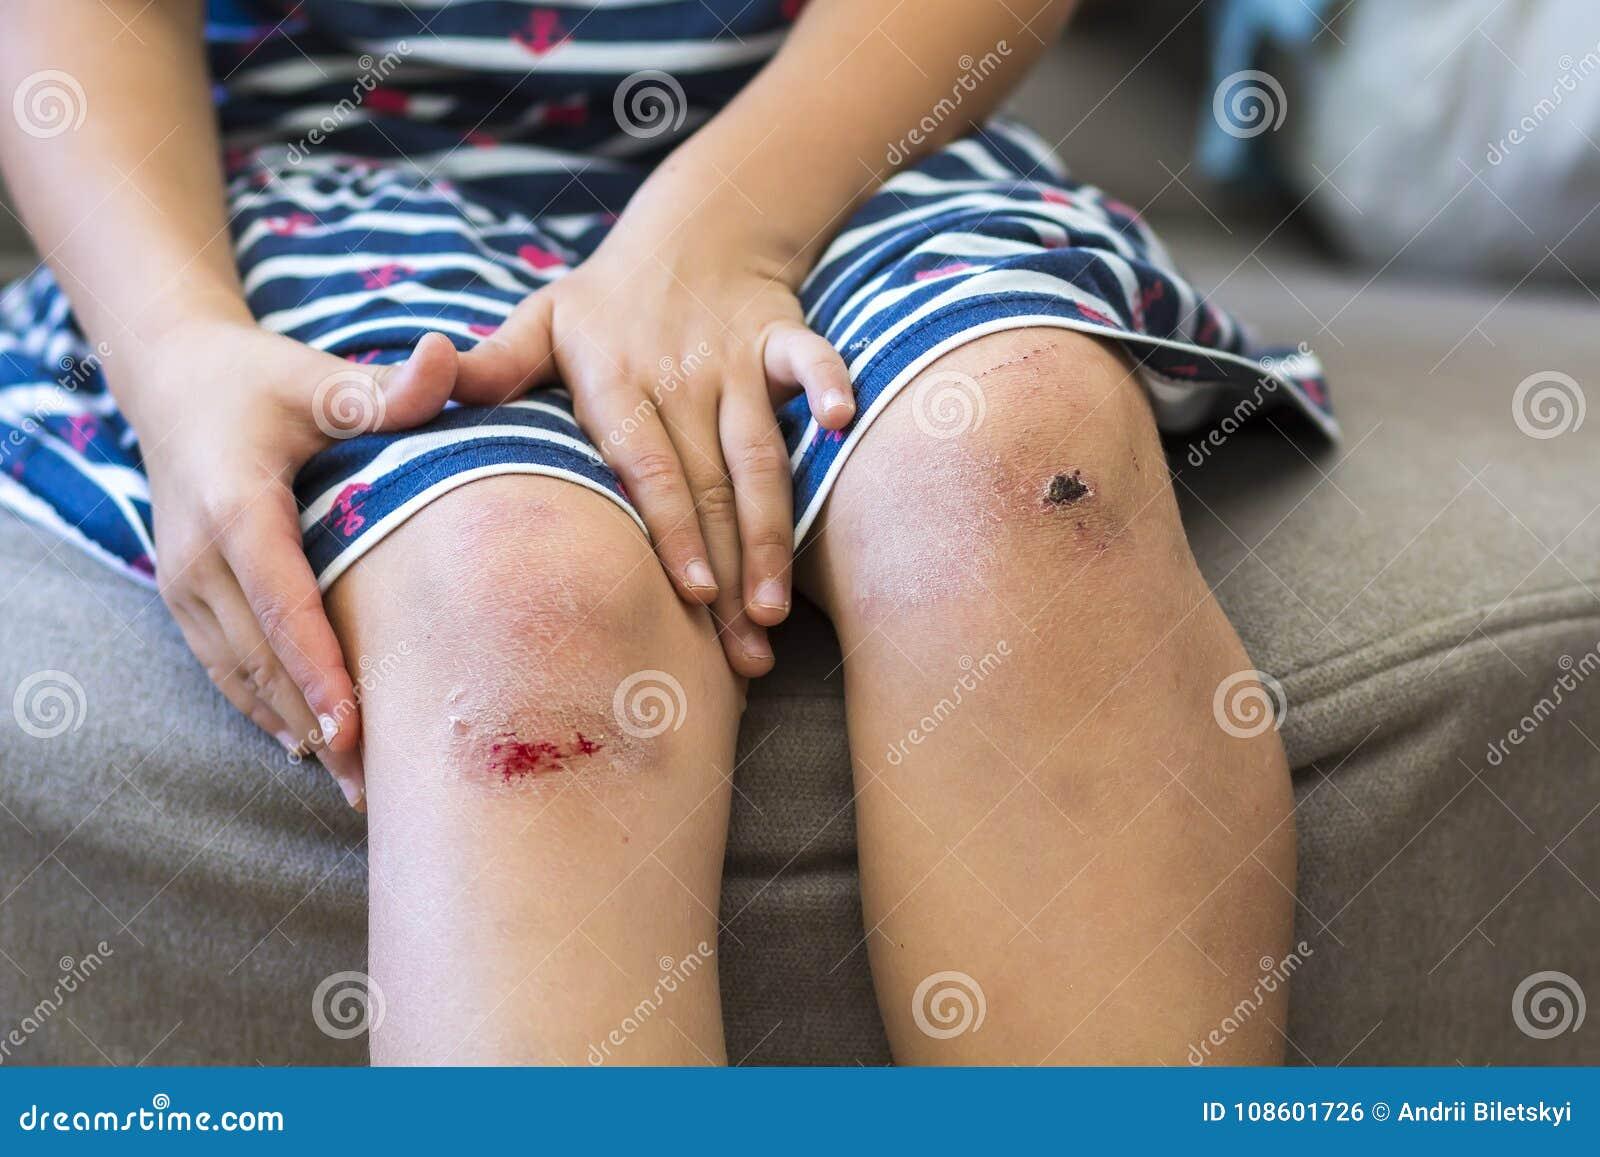 Close-up of little girl holding her bruised injured damaged knee